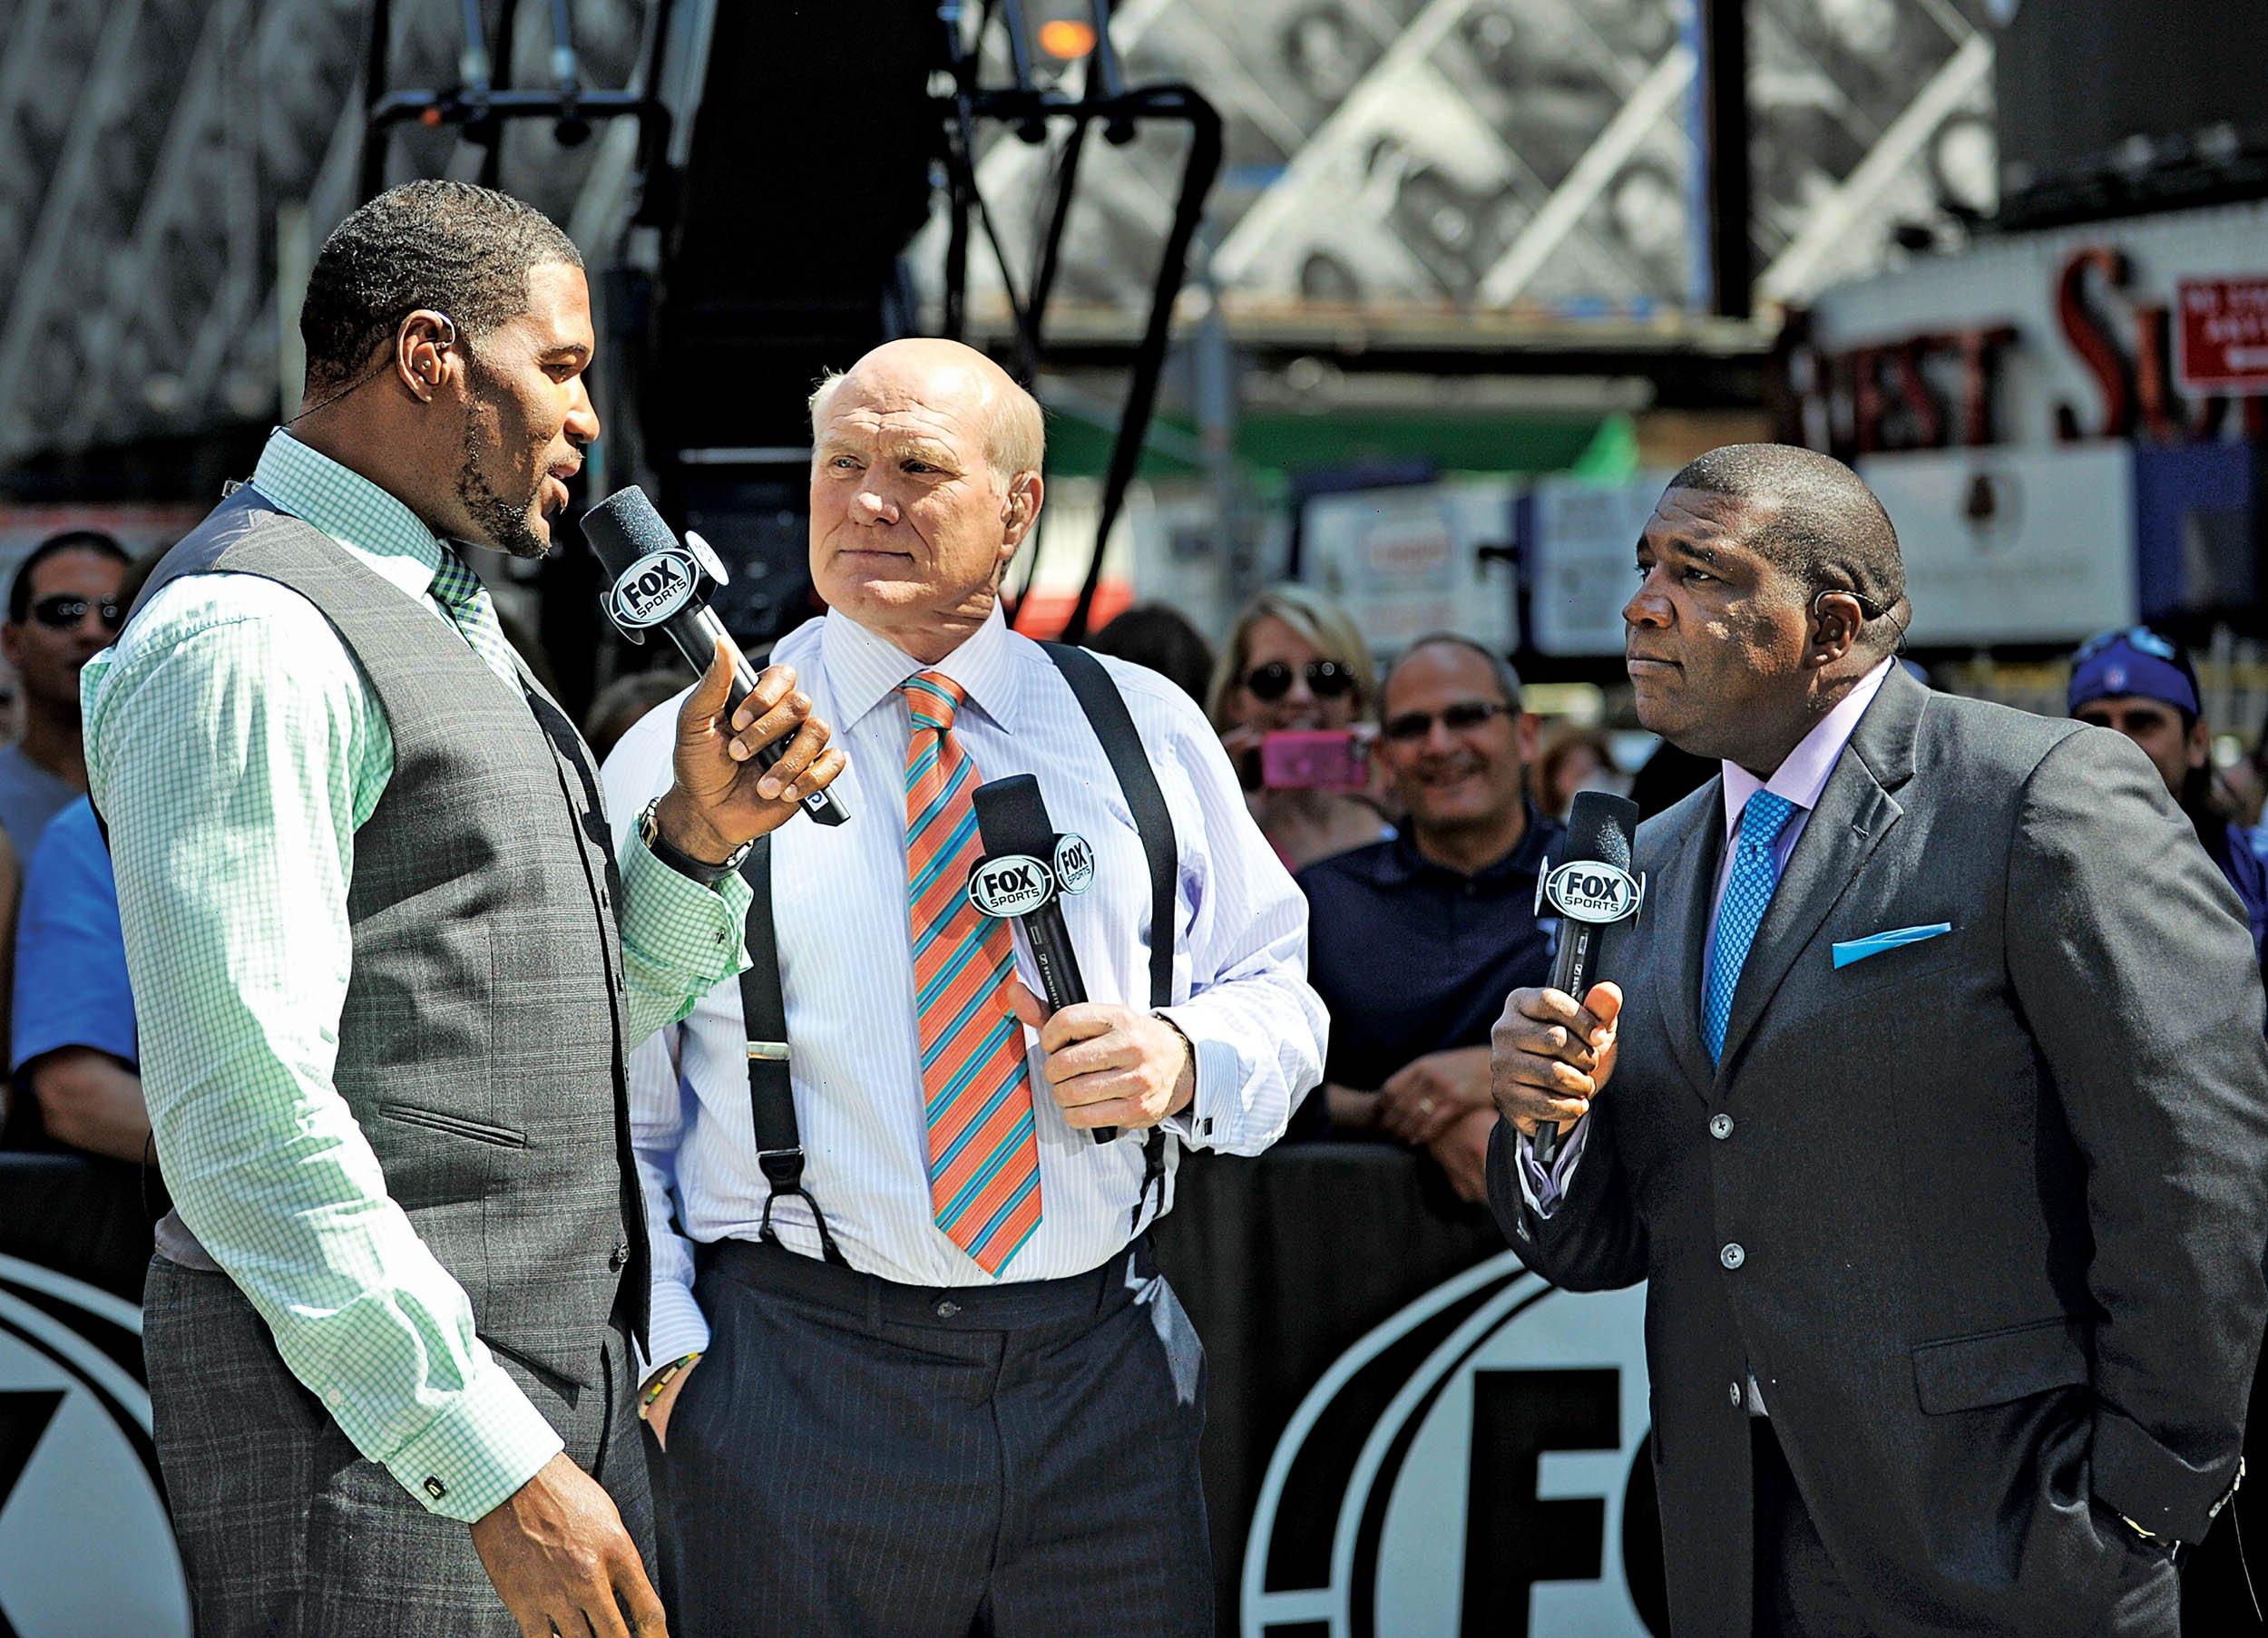 01 16 FoxNFLSunday 02 FOX NFL Sunday analysts Michael Strahan 4548ef3c0